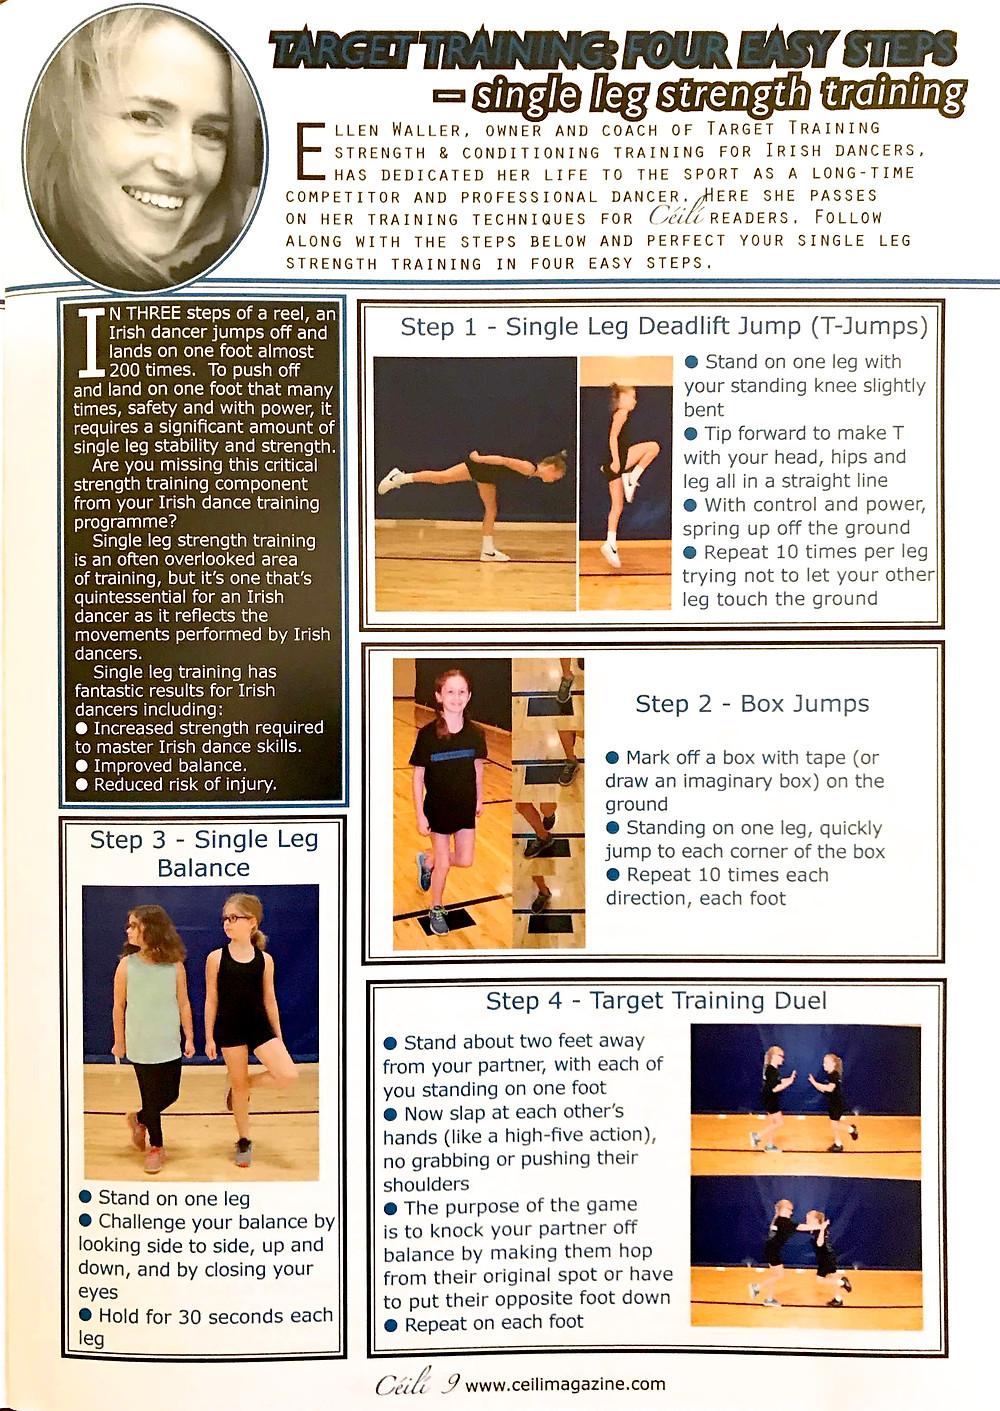 Irish dance strength and conditioning, exercises for Irish dancers, power for Irish dance